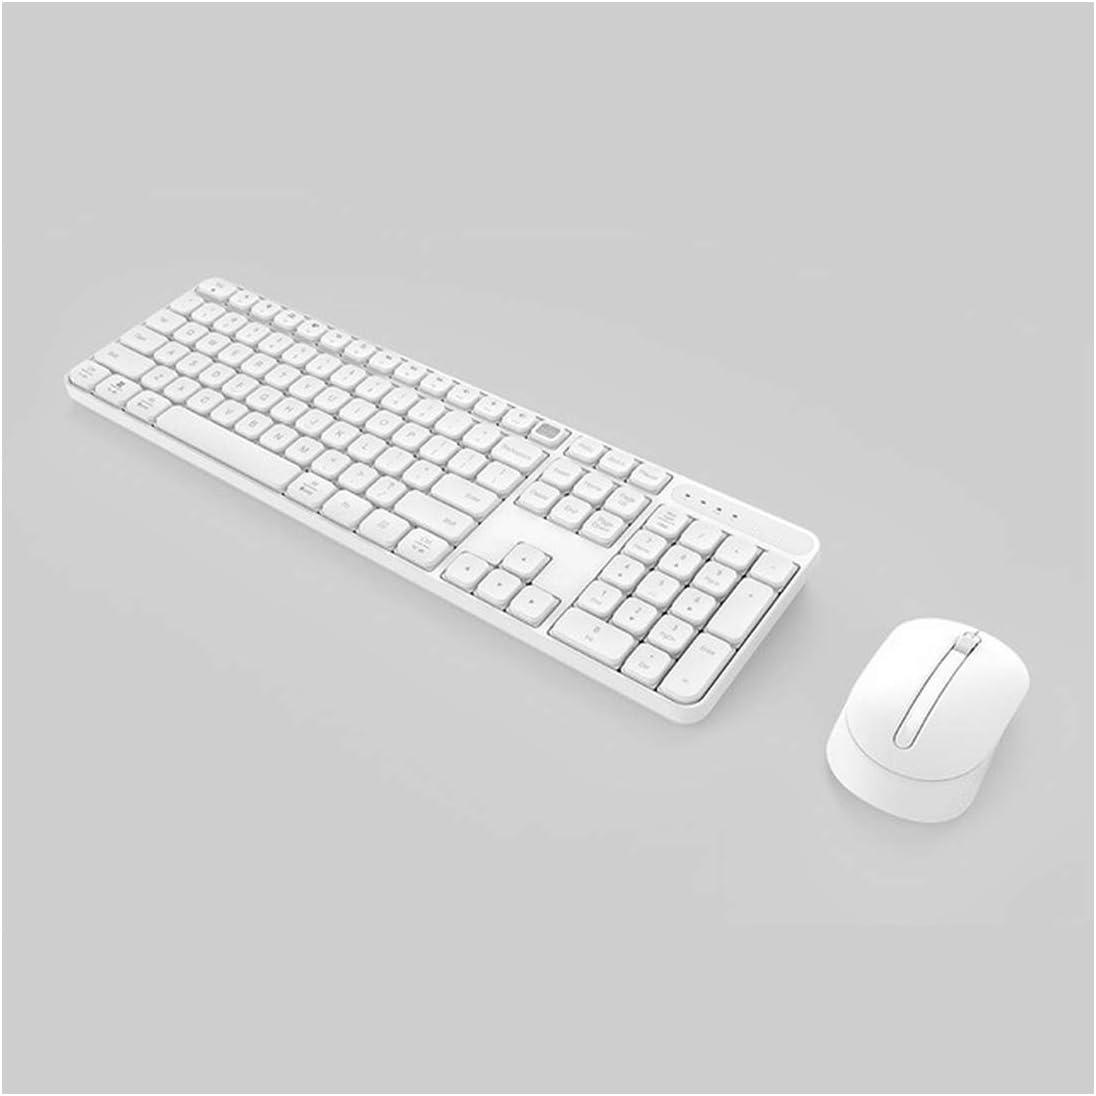 Rosing 2.4Ghz WirelessOffice Keyboard Mouse Set 104 Keys for Windows Pc Mac Compatible Portable USB Keyboard,Black